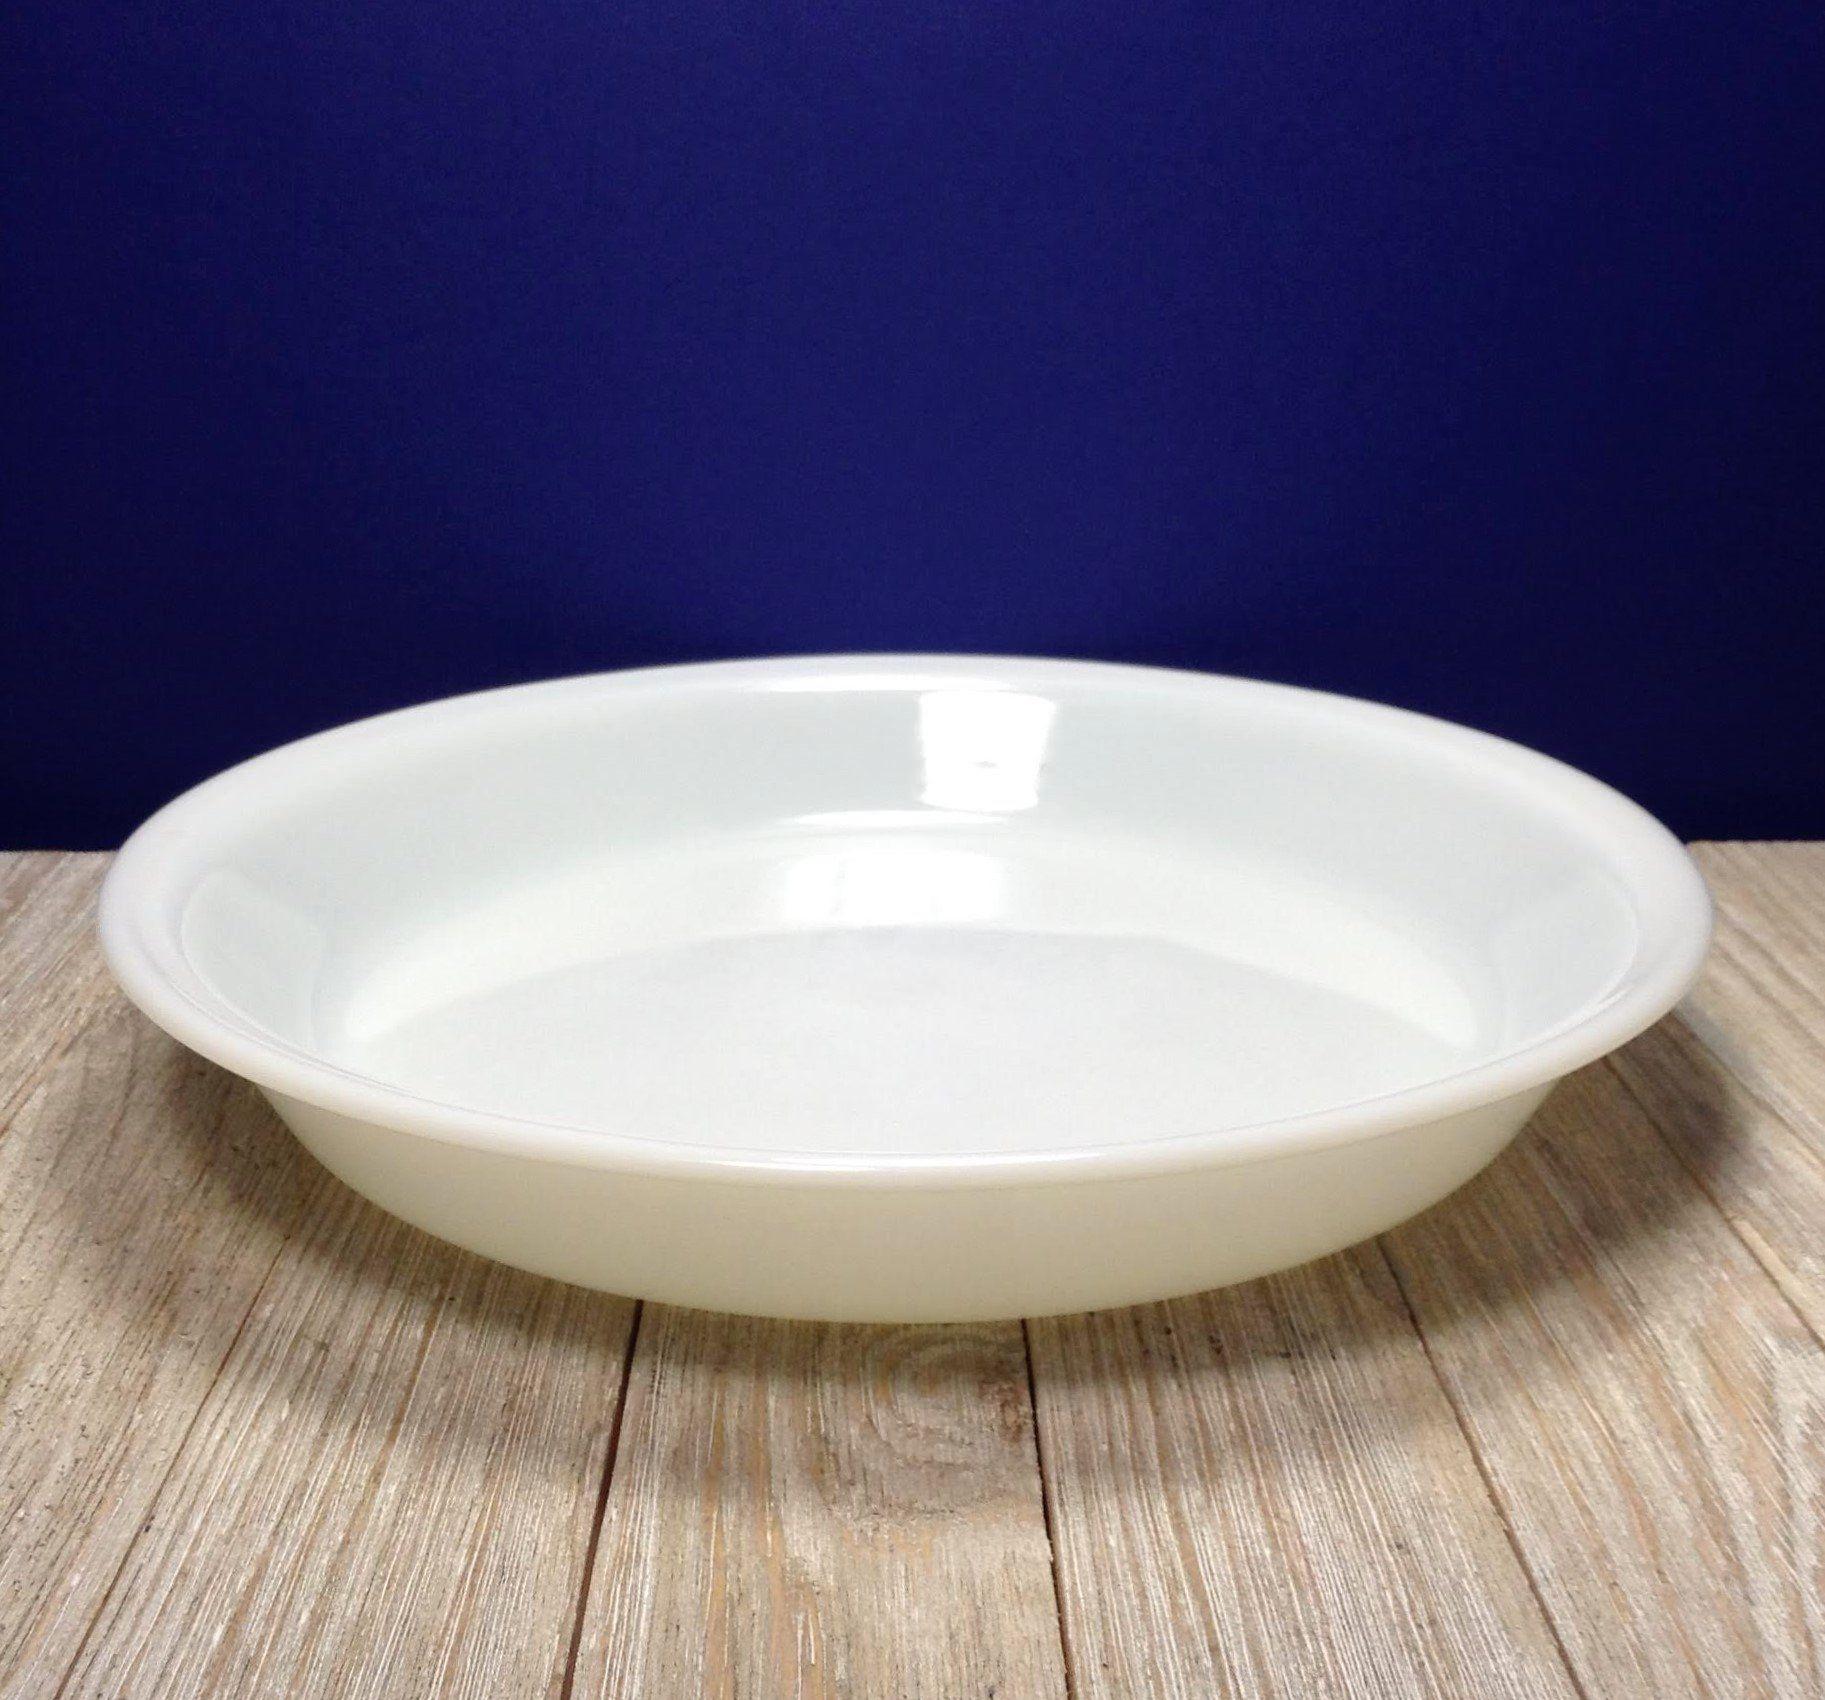 1960/'s Pyrex Golden Acorn  Oval Casserole Dish Pyrex/'s Black Scroll Oval Divided Dish Promotional Pyrex Patterns